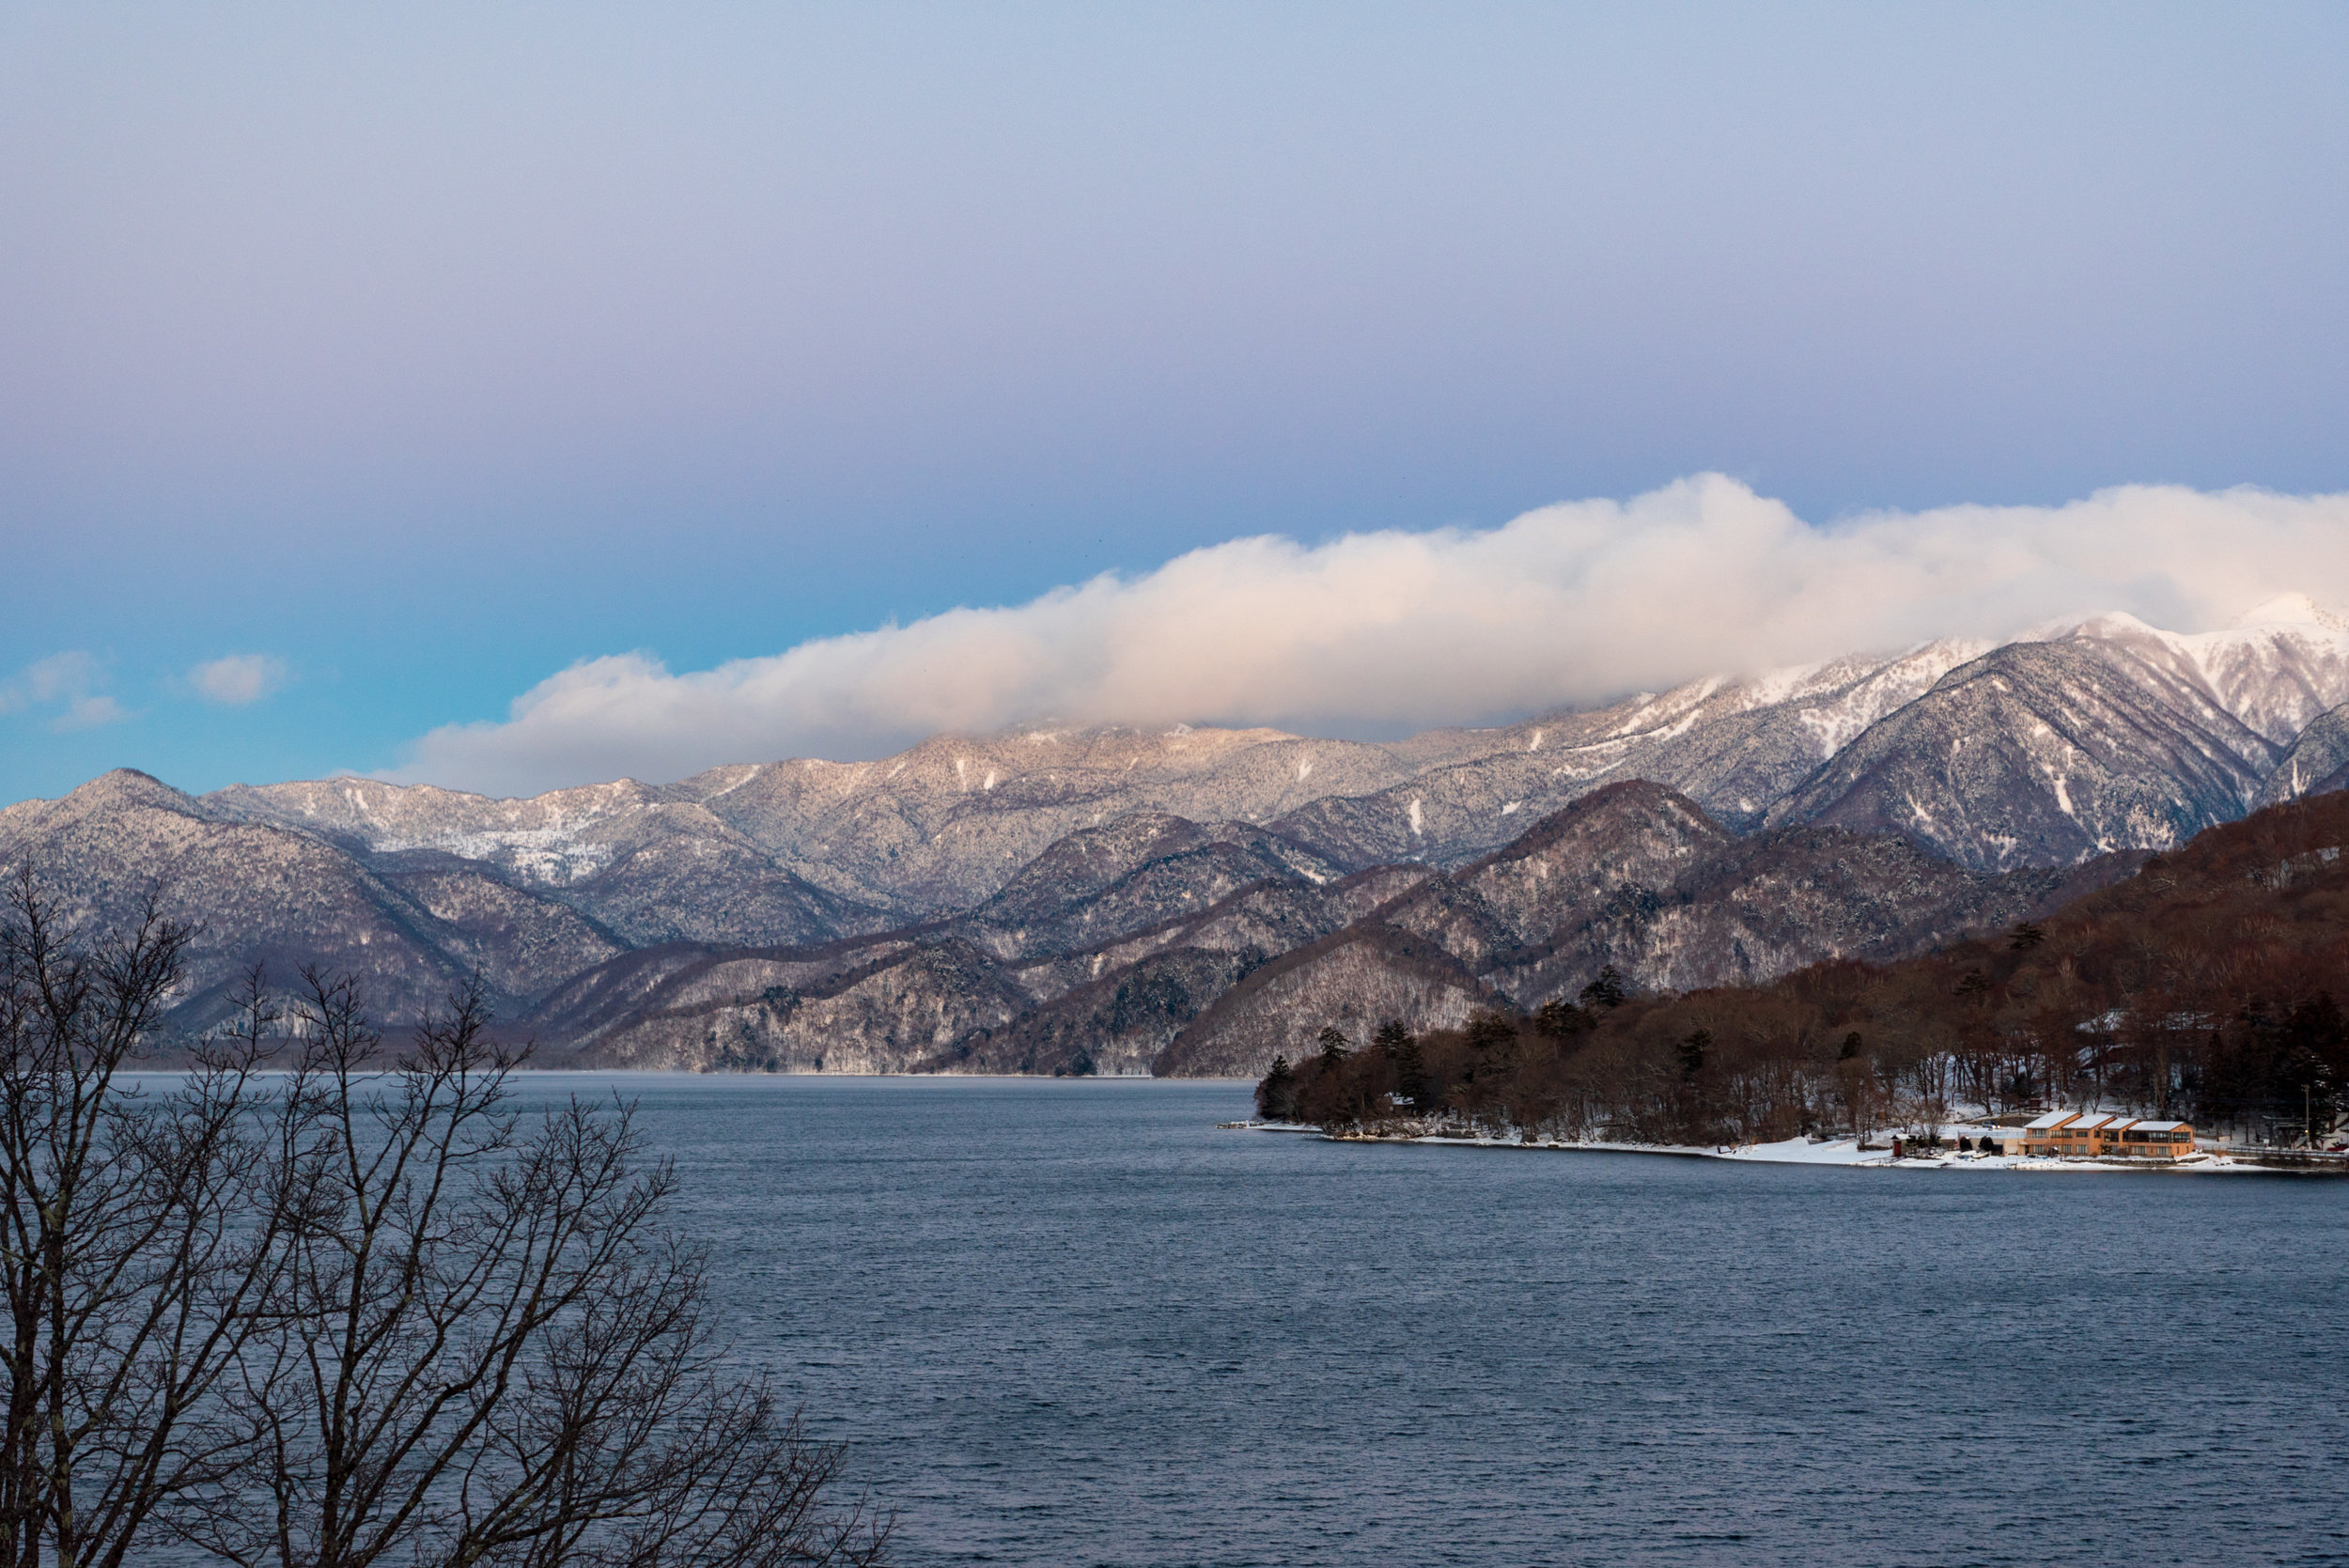 View of Lake Chuzenji and Mountains  Japanese-style Room with Lake View GL2 - Hoshino Resorts KAI Nikko